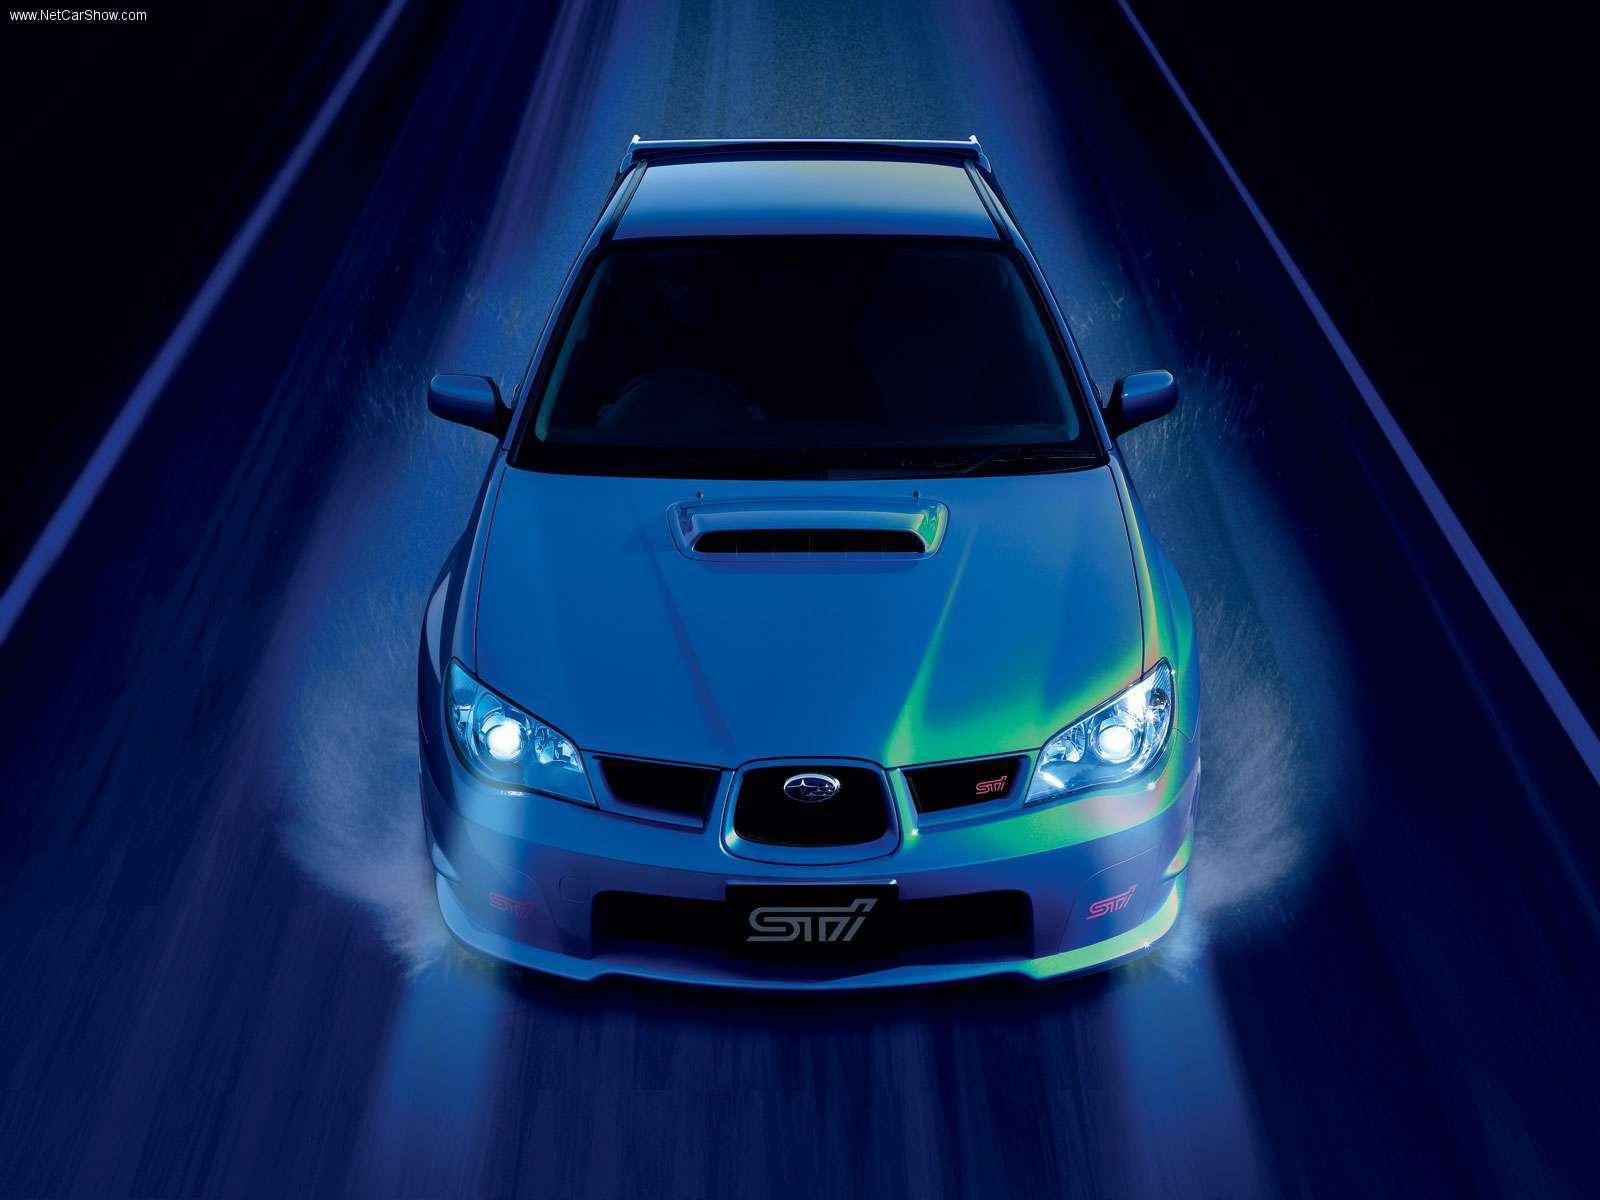 Free Download Subaru Impreza Wrx Sti Wallpaper Hd